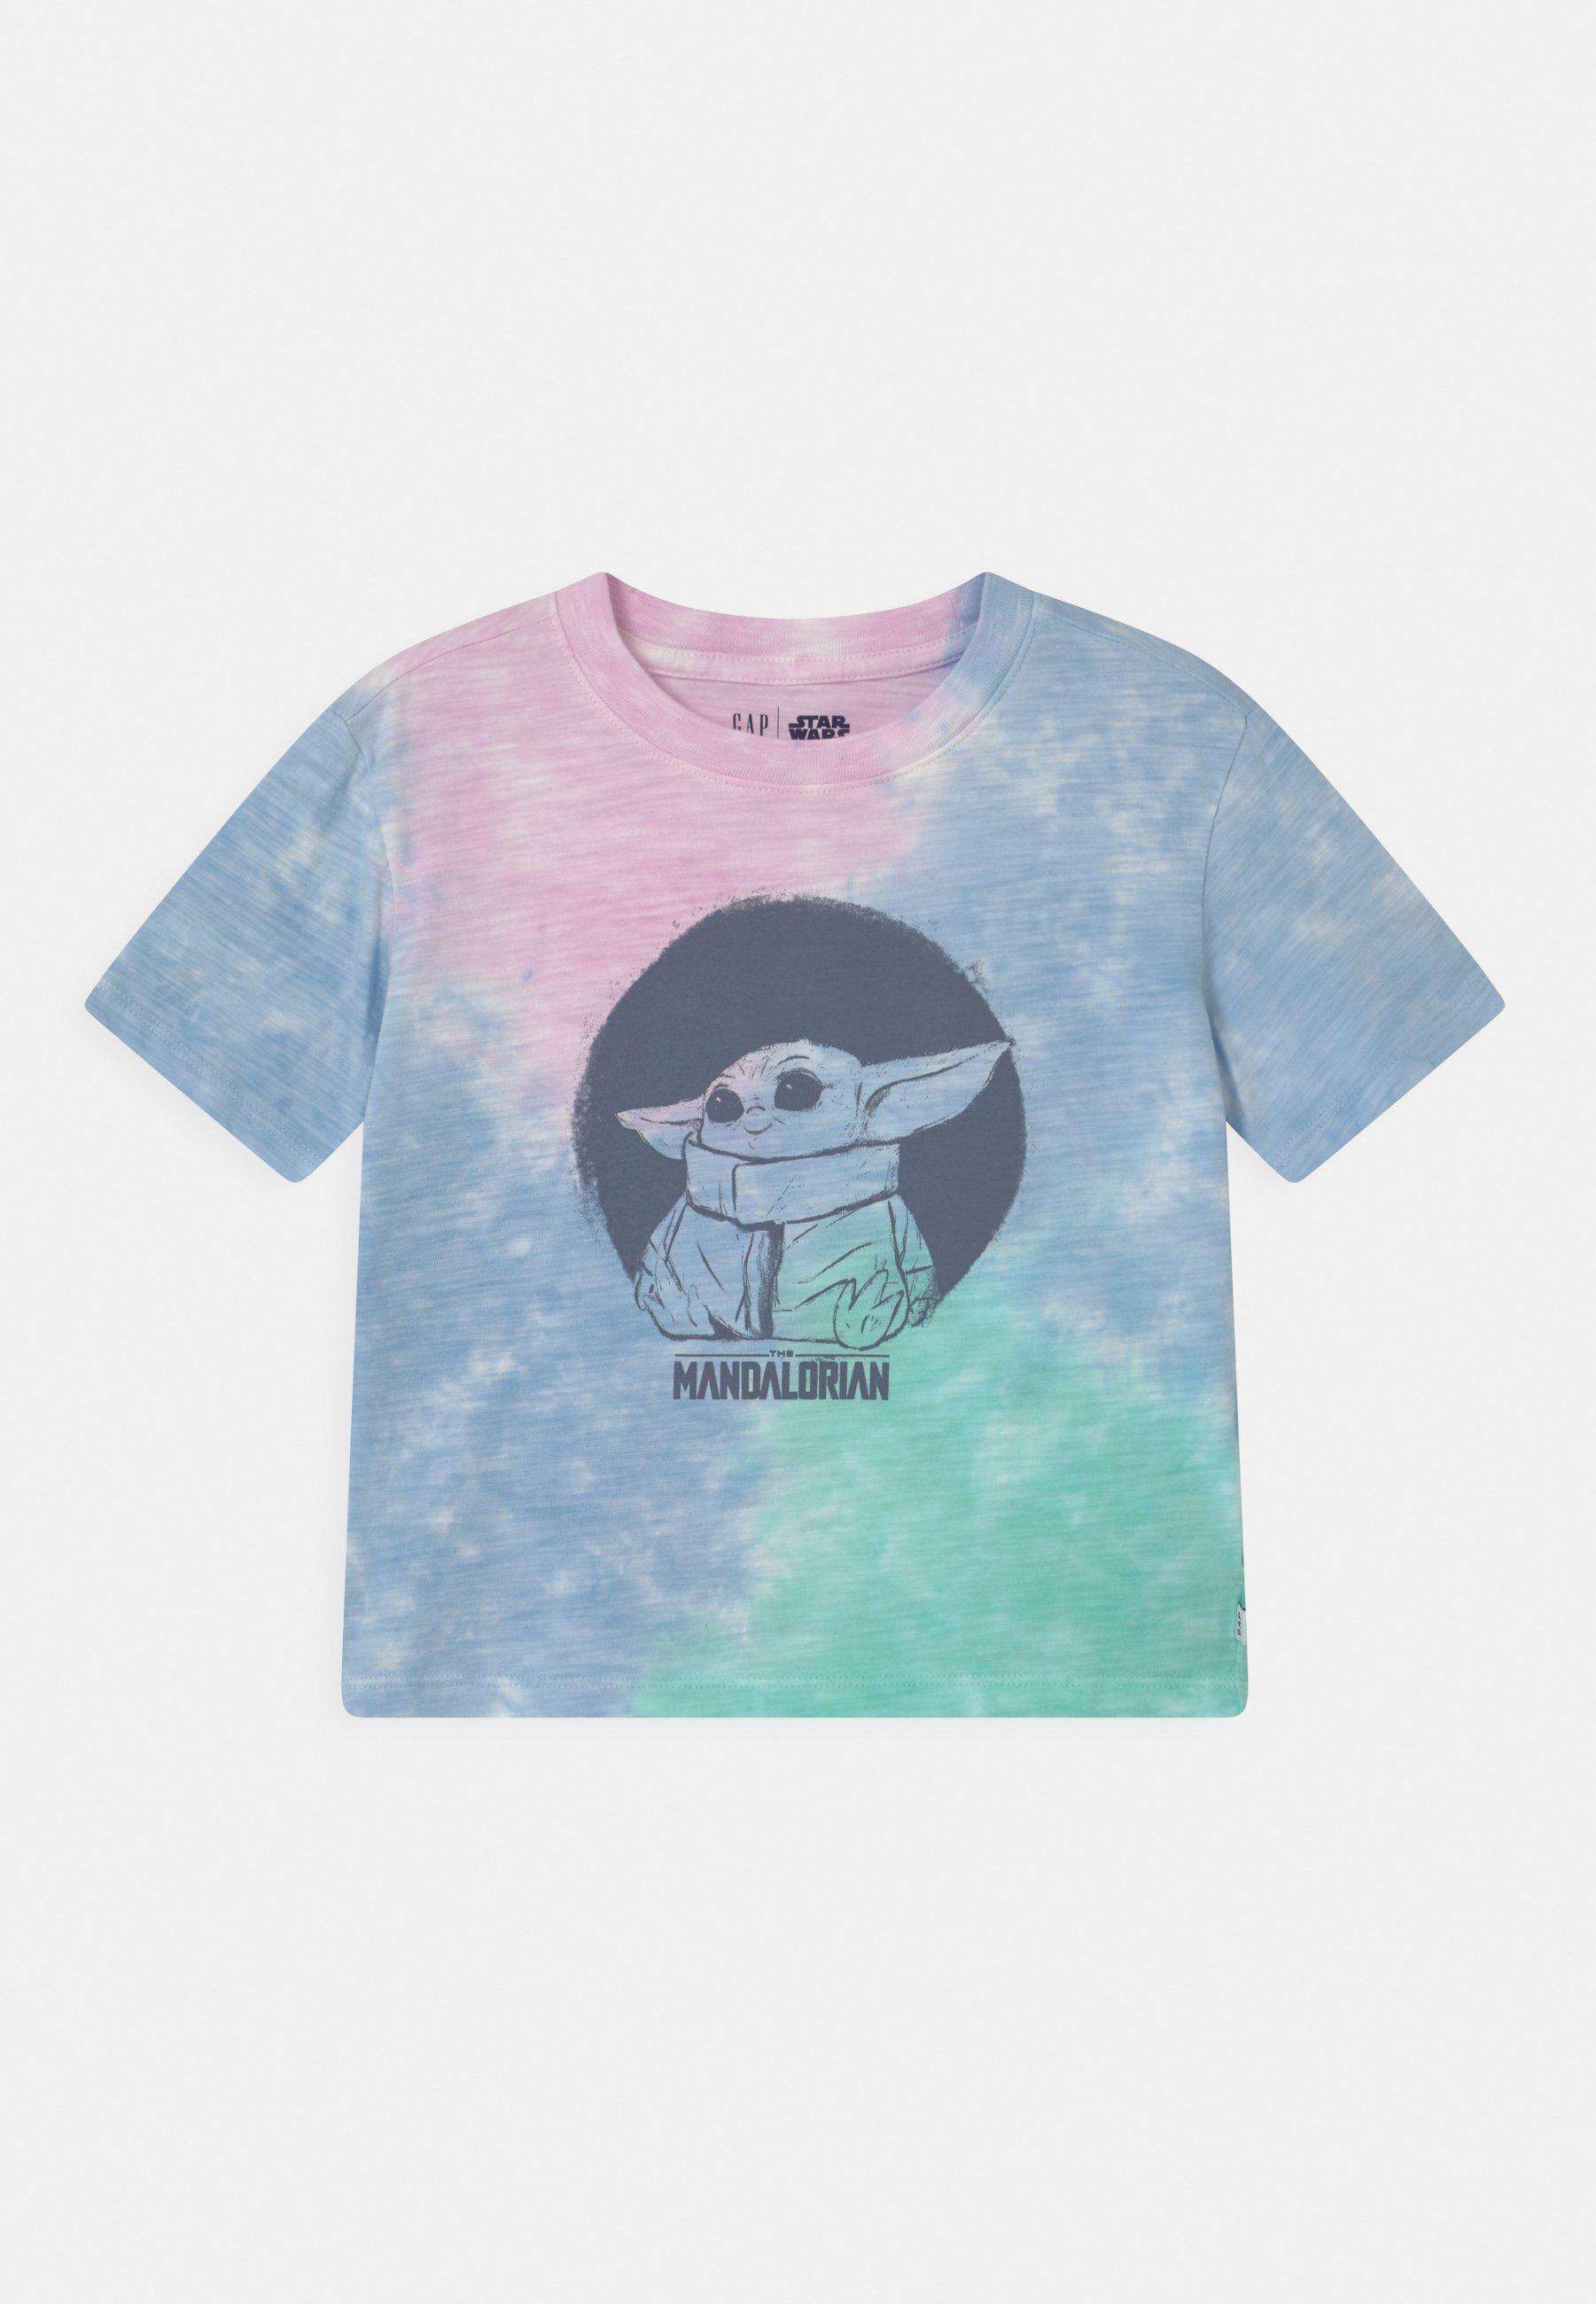 Kids GIRL MANDOLORIAN THE CHILD STAR WARS - Print T-shirt - purple